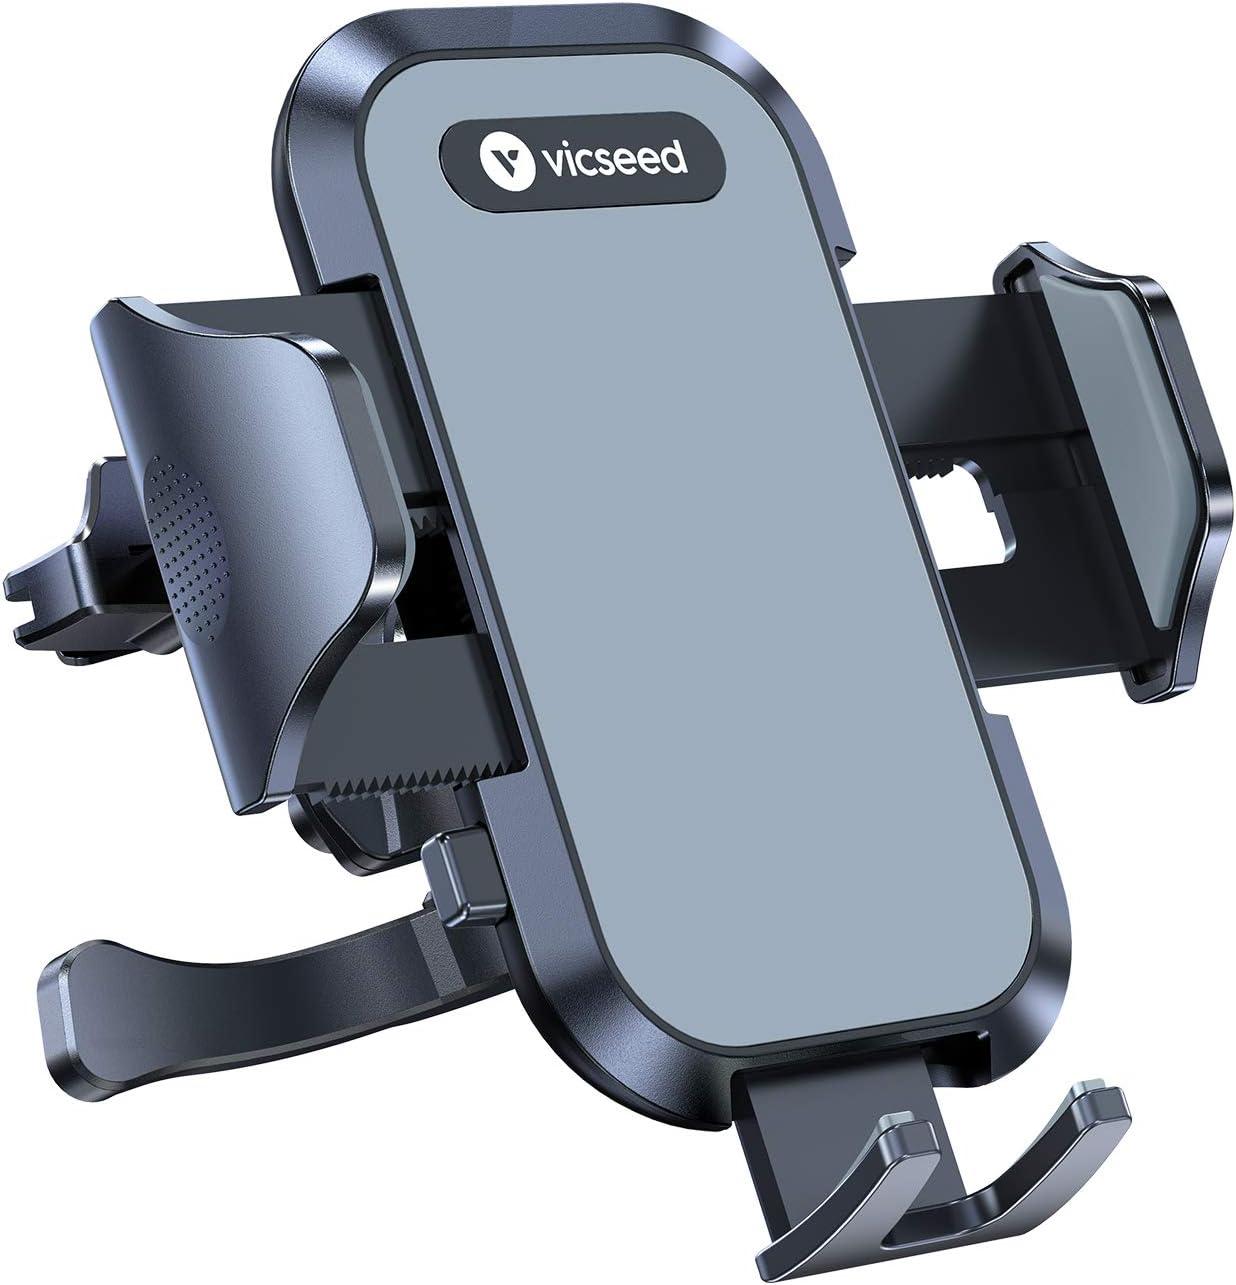 Best phone mounts for vertical vents, visceed phone holder for vertical vents